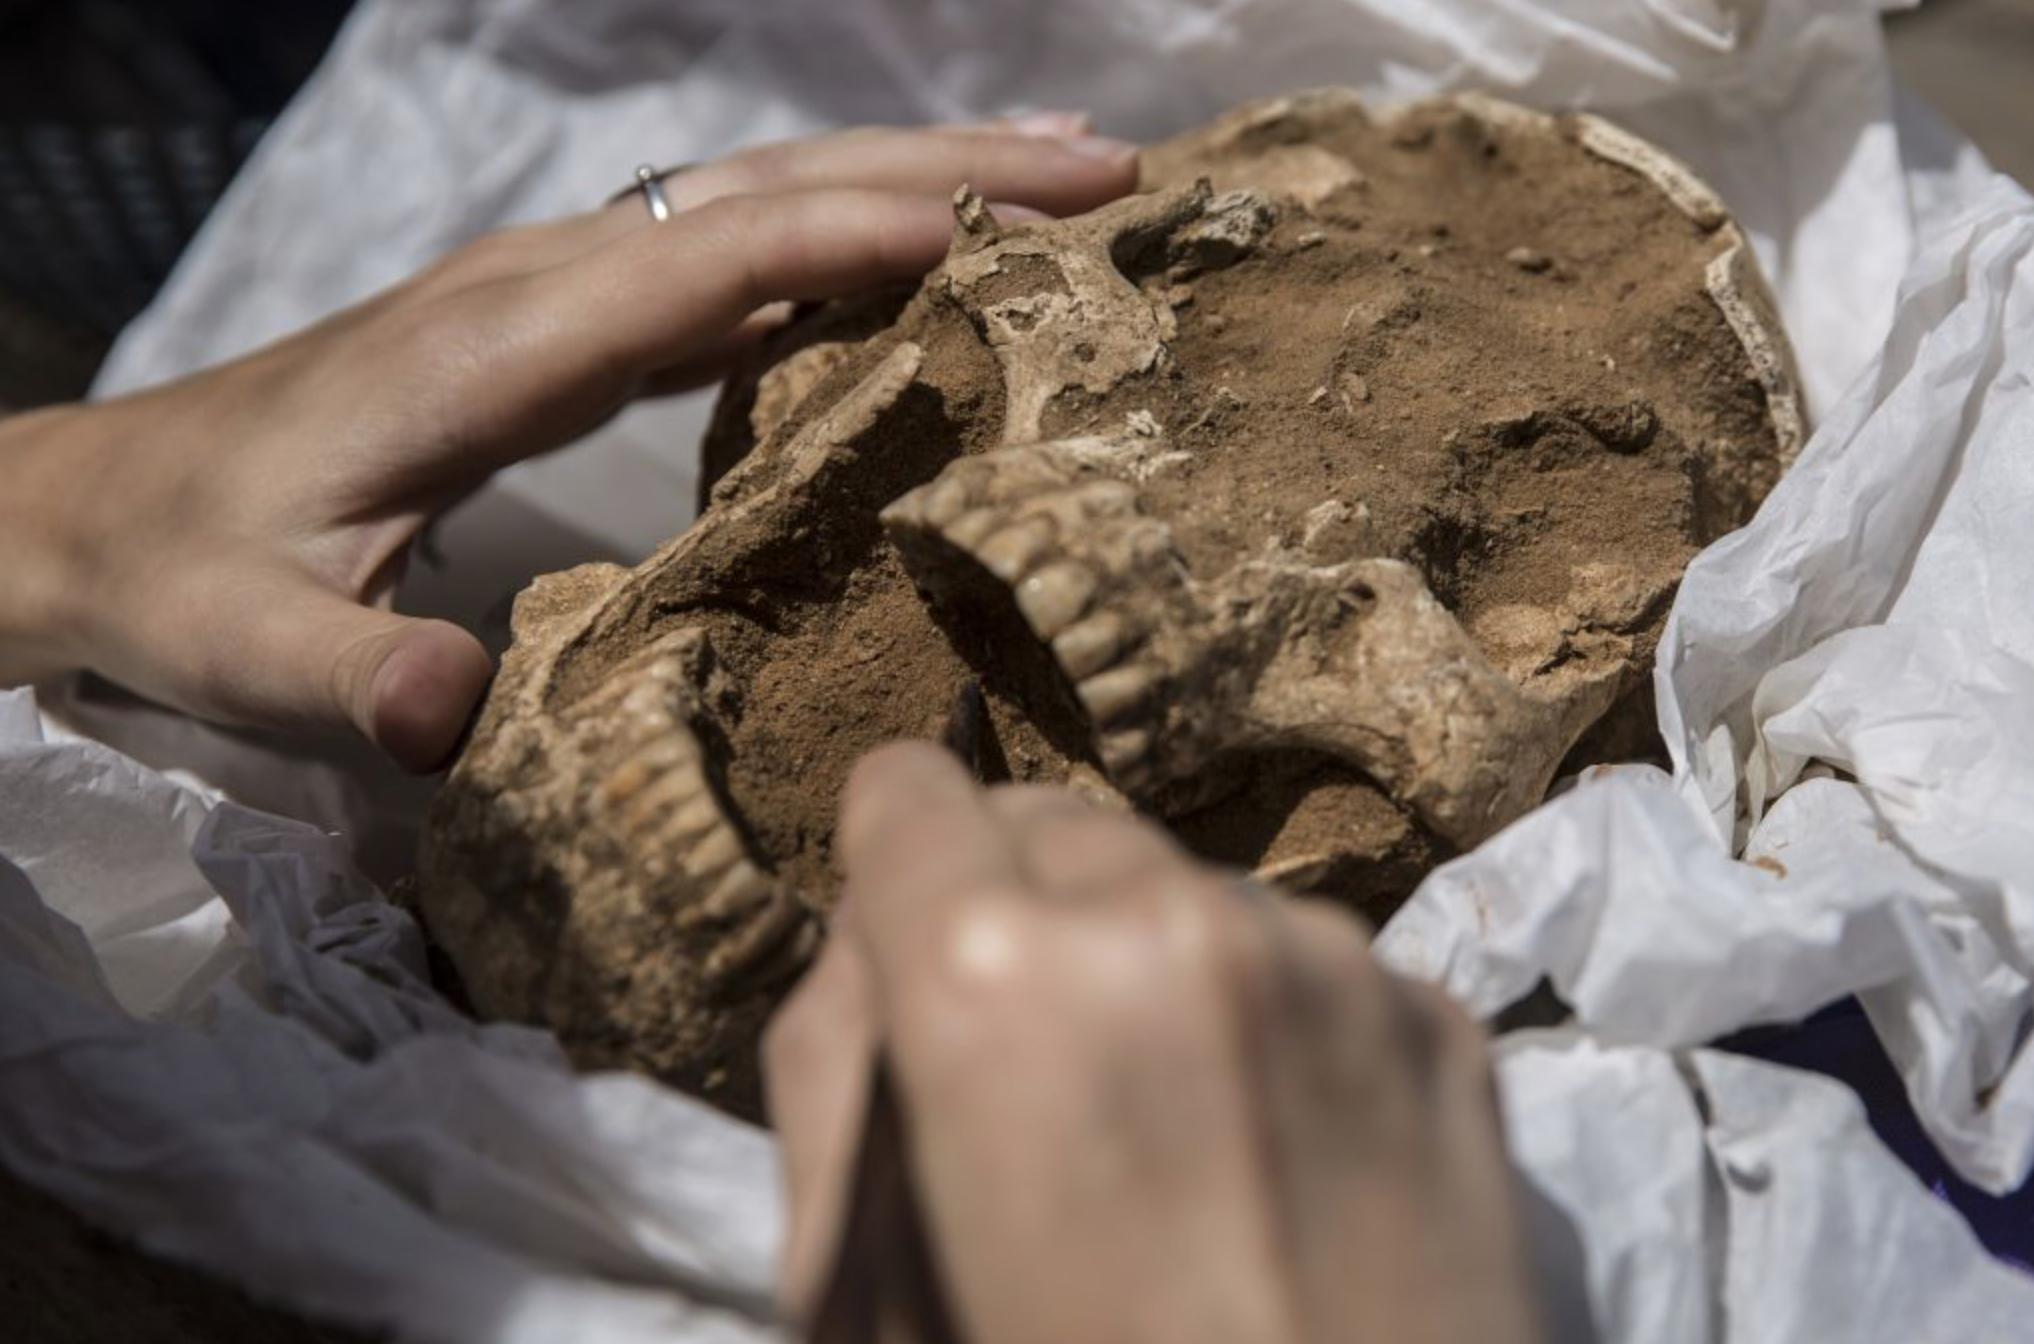 Philistine Skull discovered in Ashkelon